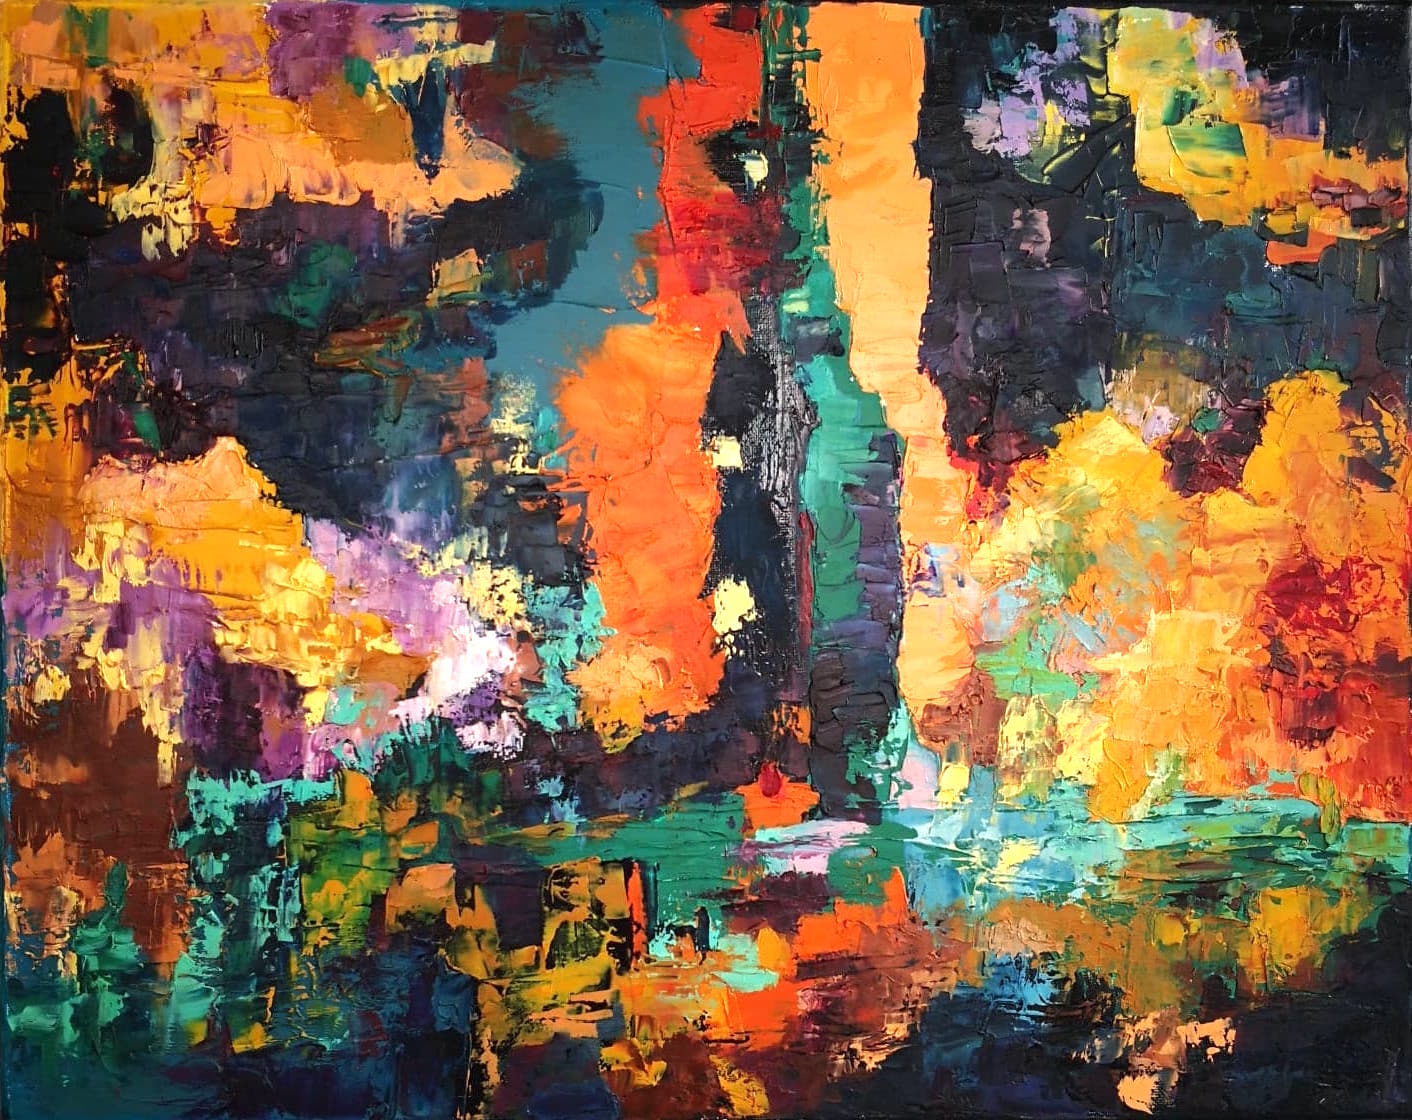 Heather M. Johnson, Tandem, Oil on canvas, 16 x 20 inches, $325.jpg